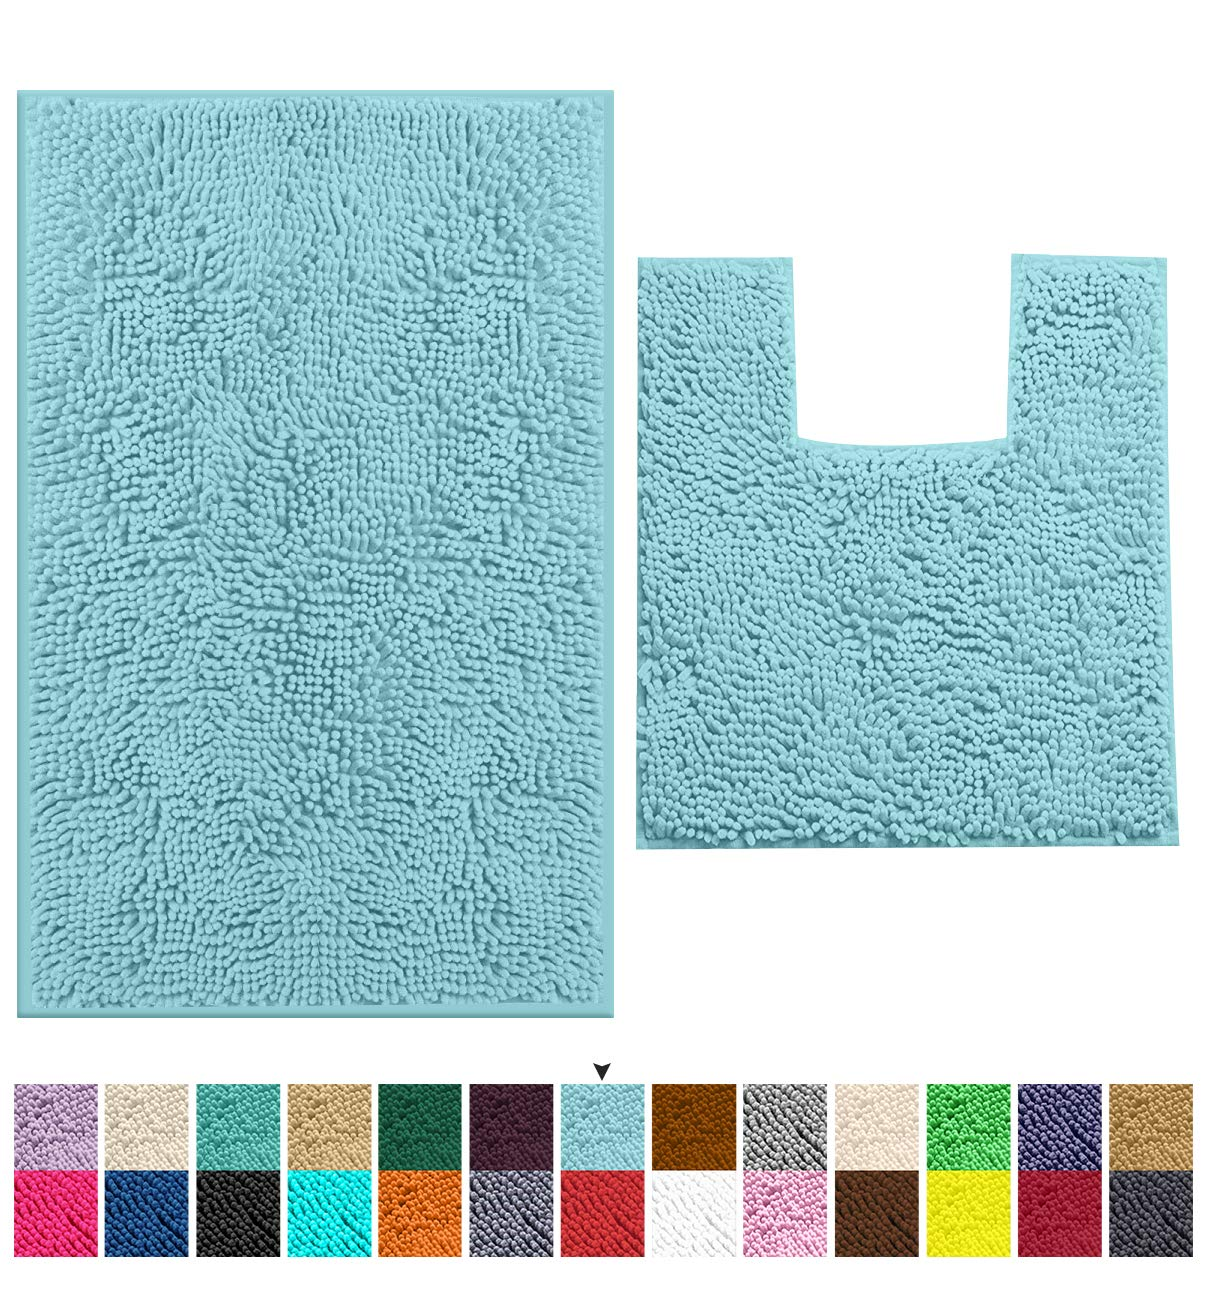 LuxUrux Bathroom Rugs Luxury Chenille 2-Piece Bath Mat Set, Soft Plush Anti-Slip Bath Rug +Toilet Mat.1'' Microfiber Shaggy Carpet, Super Absorbent Machine Washable Mats (Curved Set Medium, Spa Blue)